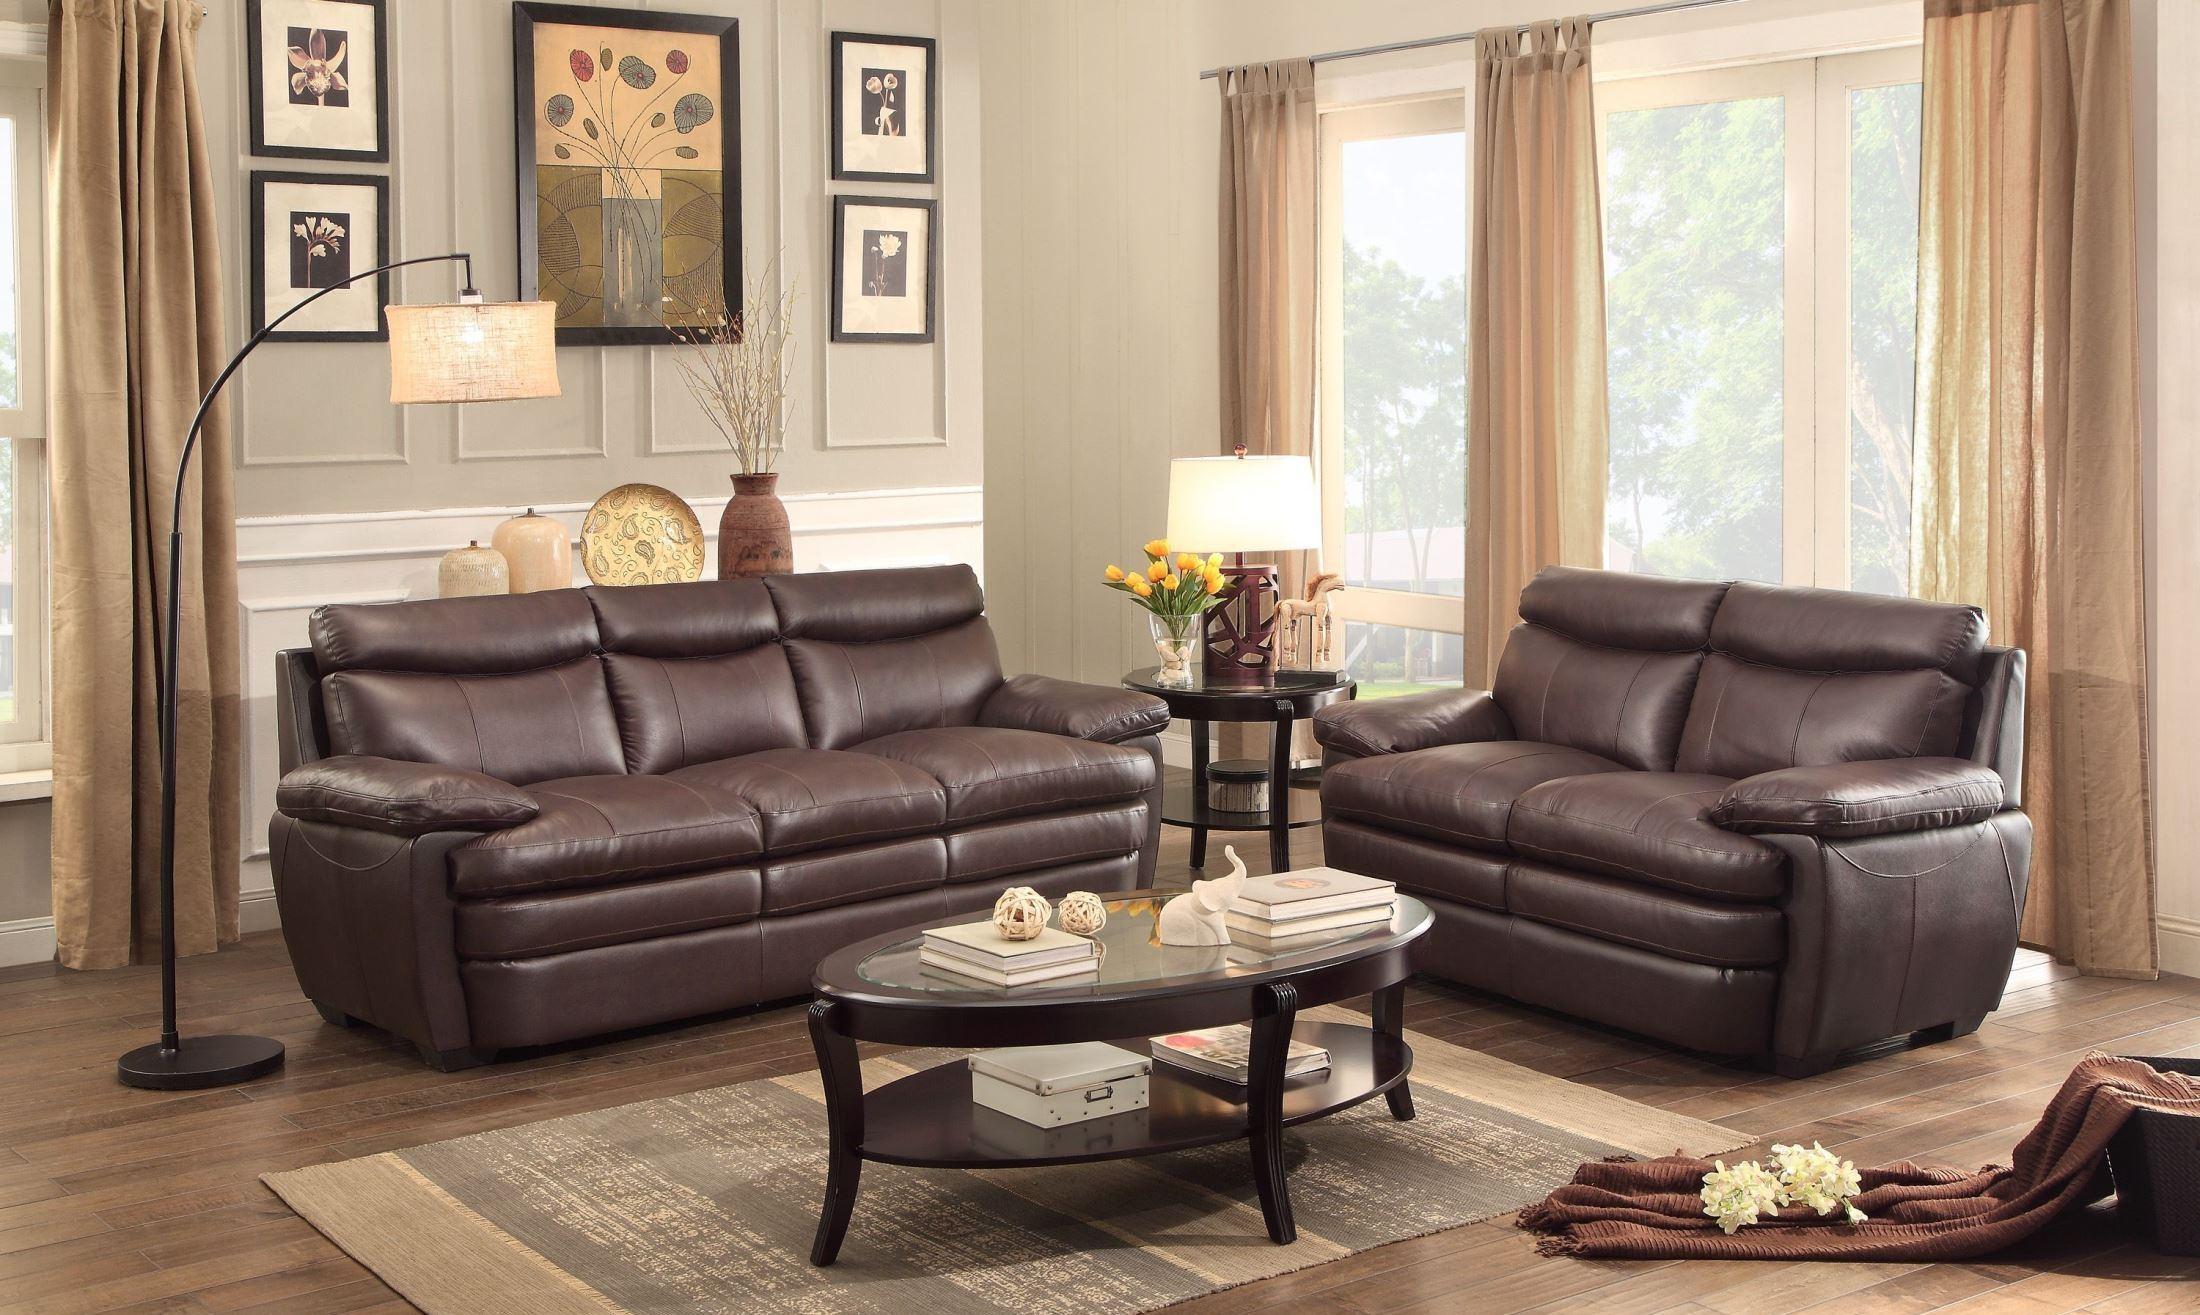 Rozel dark brown living room set from homelegance 8428 3 for Brown living room set